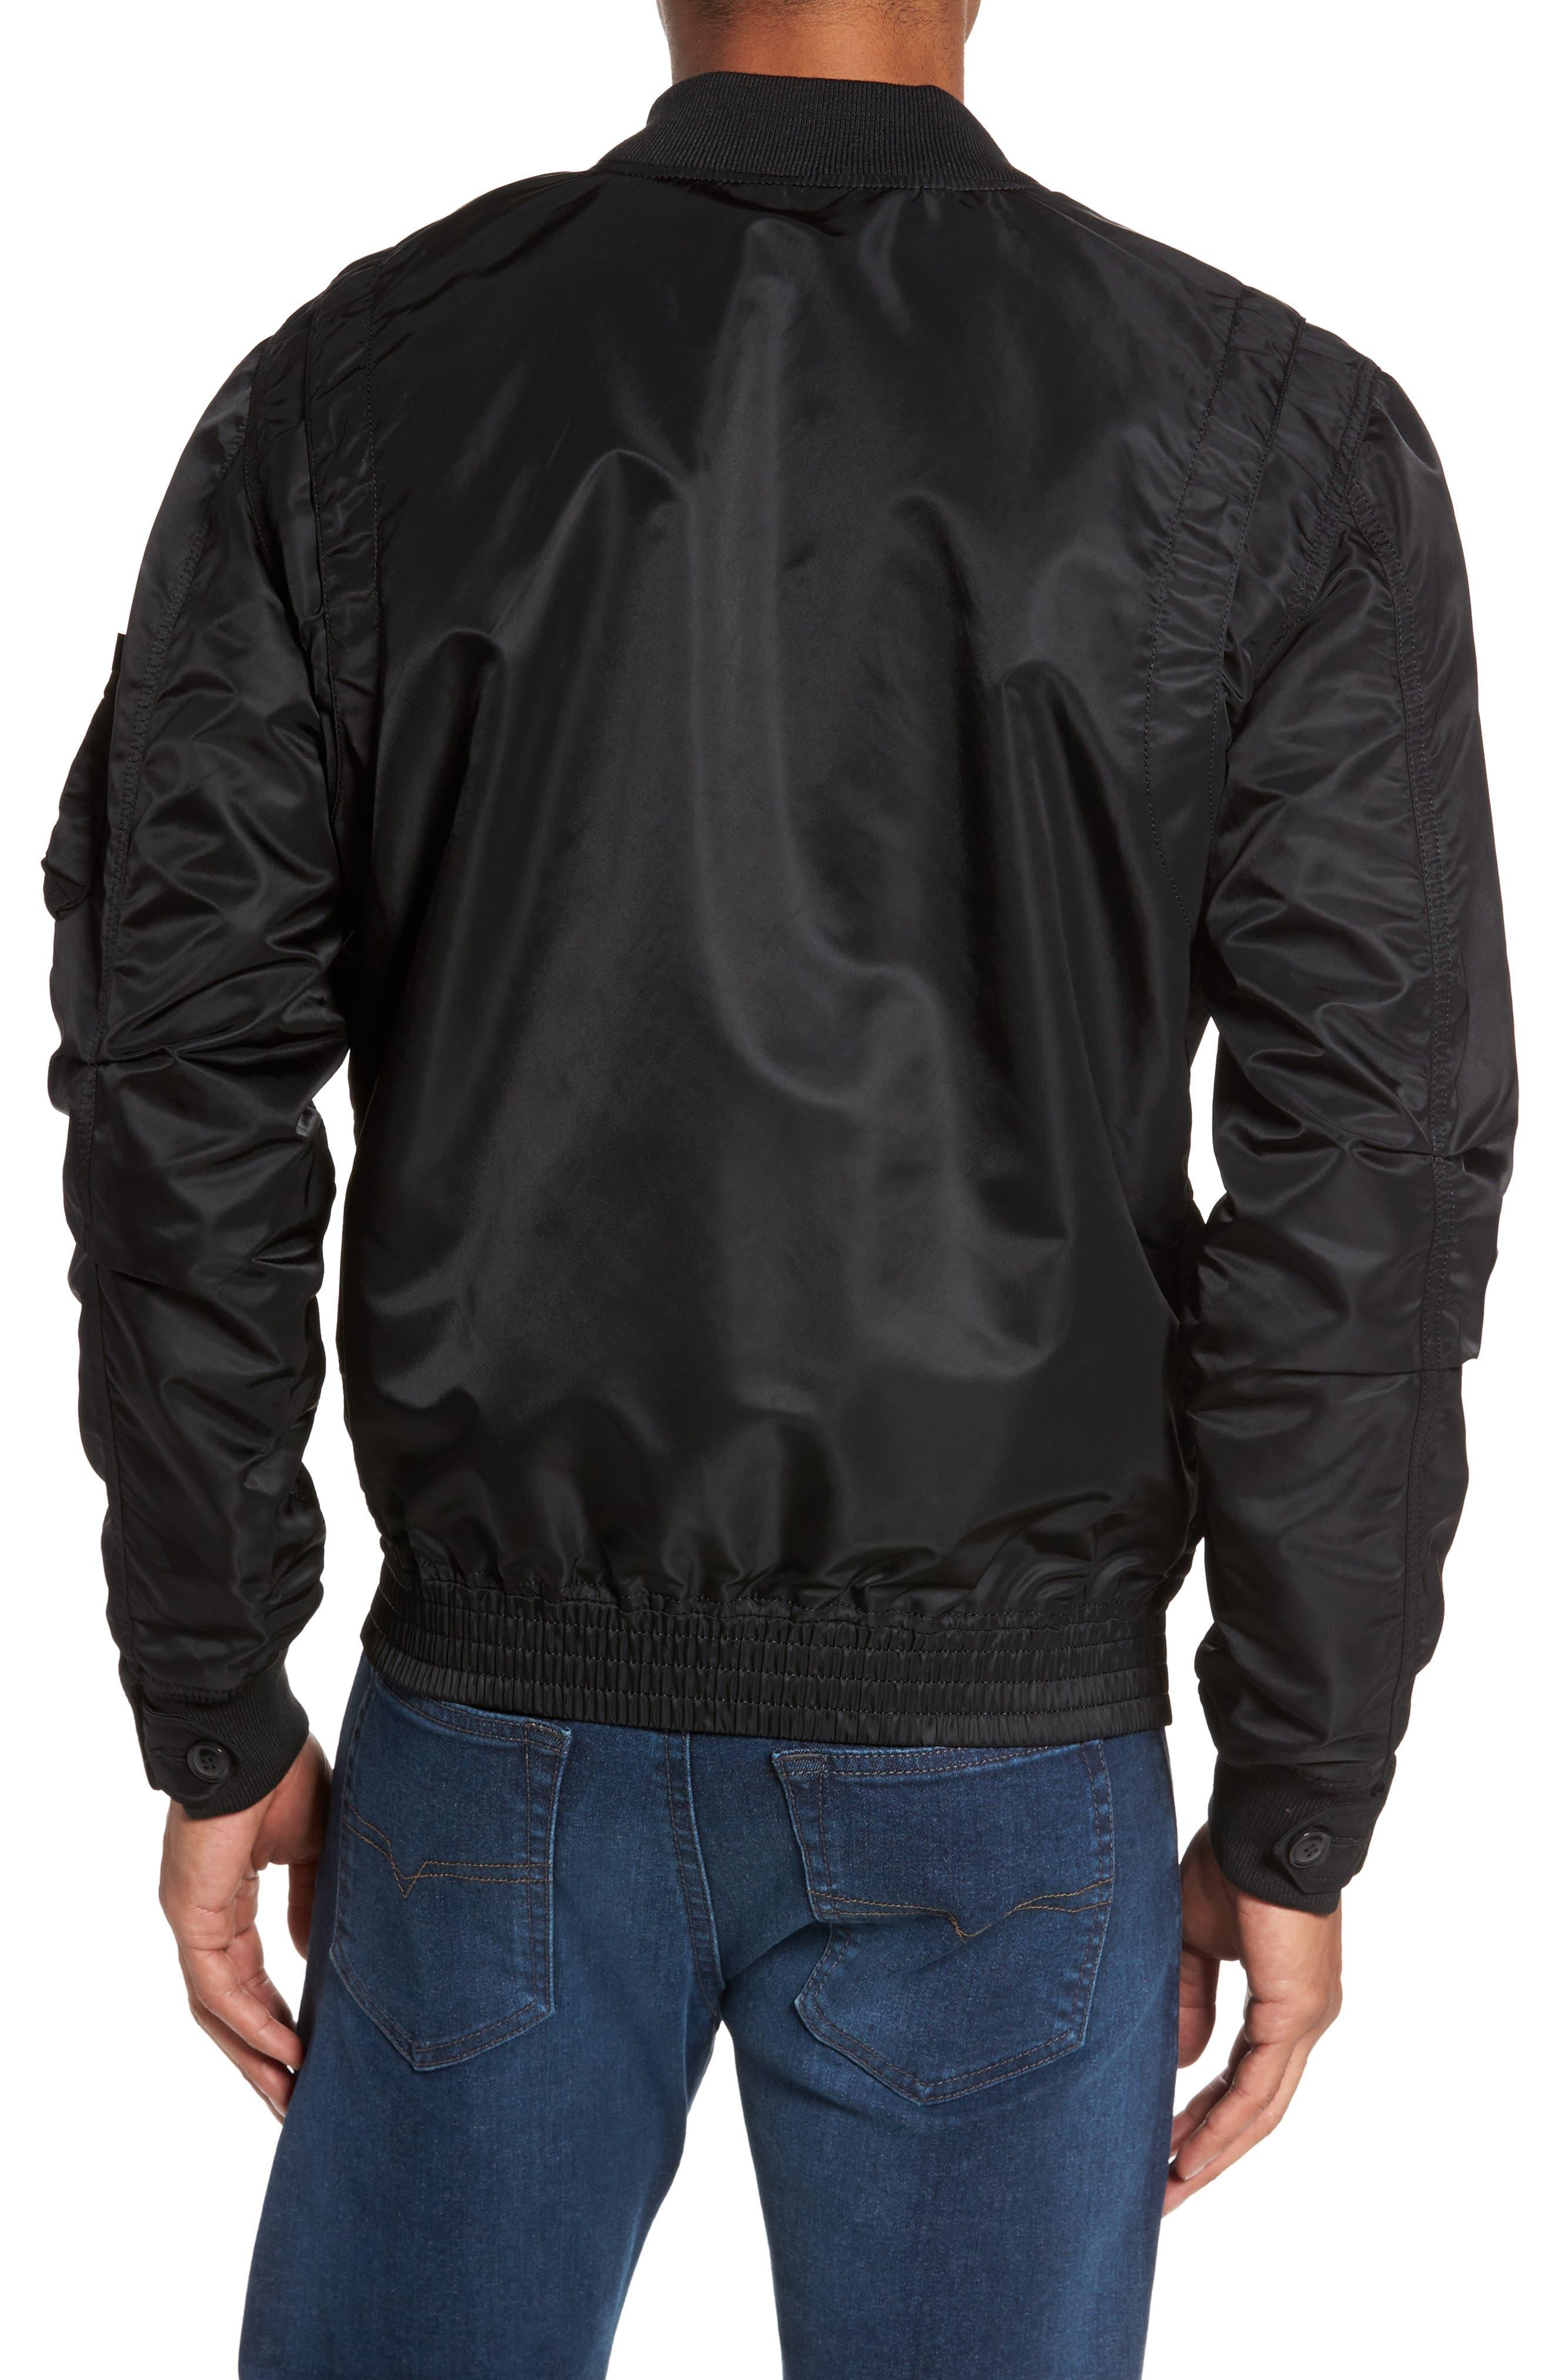 Weps Mod Jacket,                             Alternate thumbnail 2, color,                             001